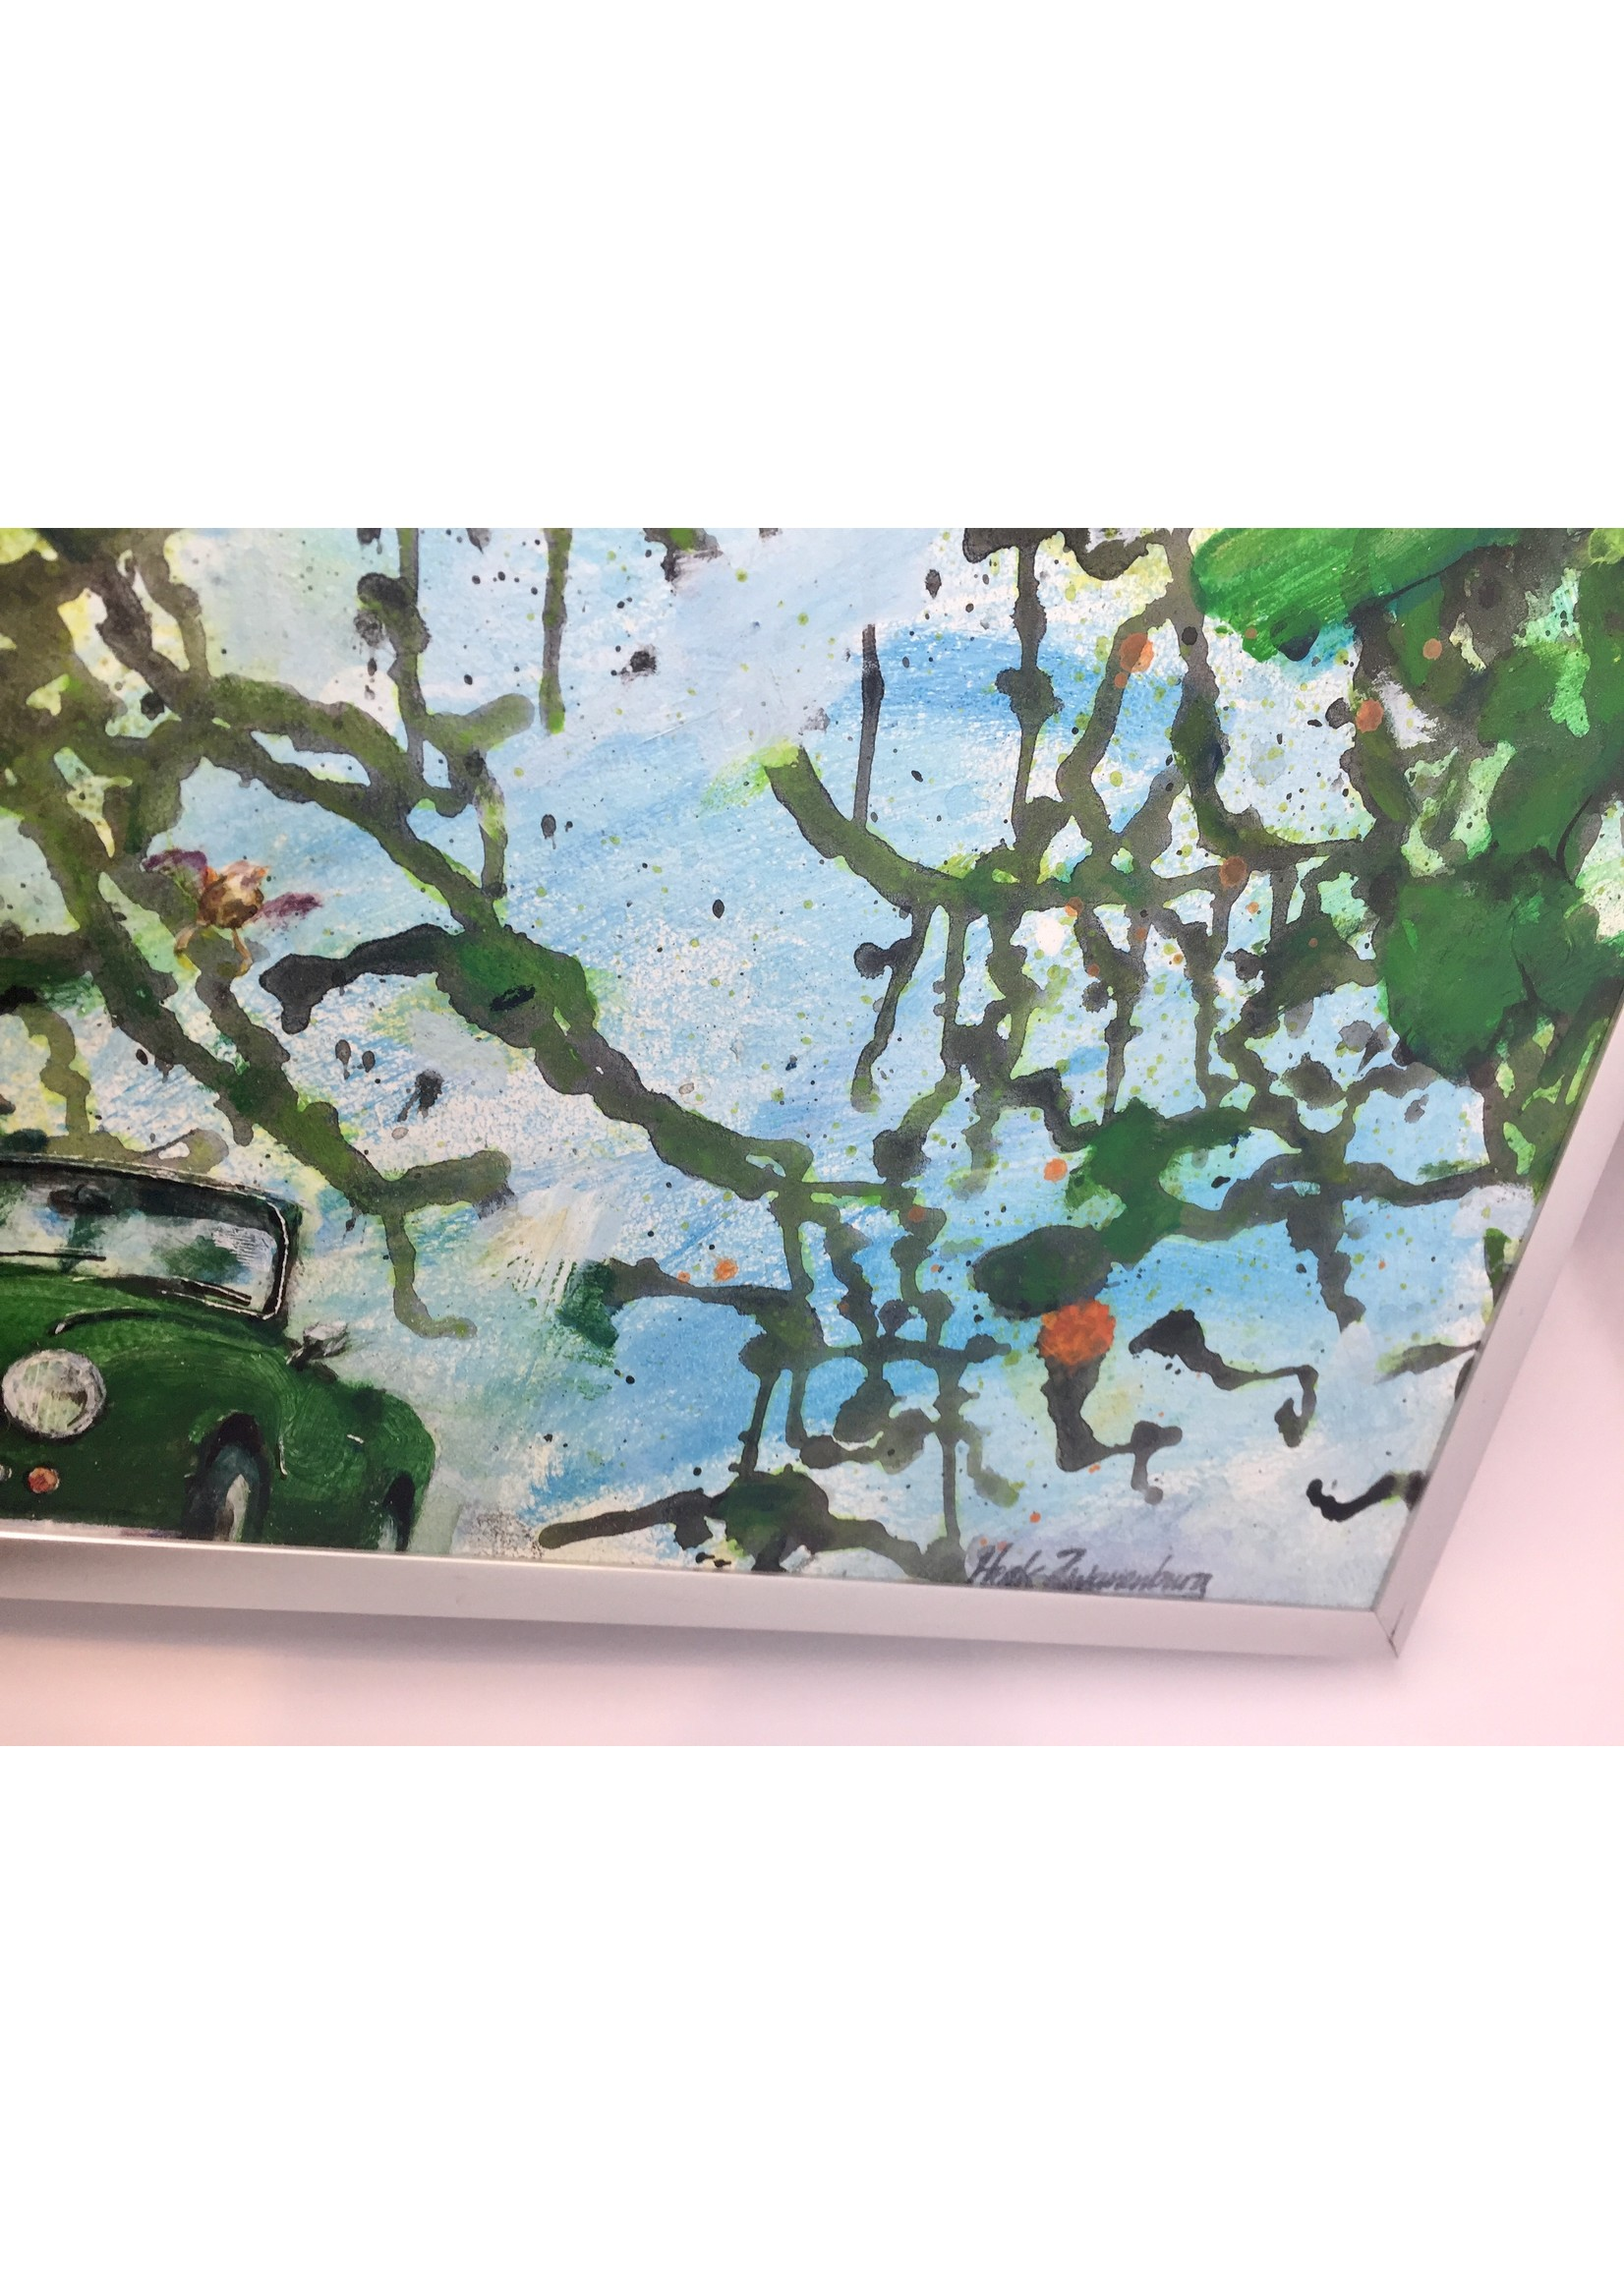 'Boslaan (Triumph Spitfire)' - Henk Zwanenburg  (acrylic on panel)